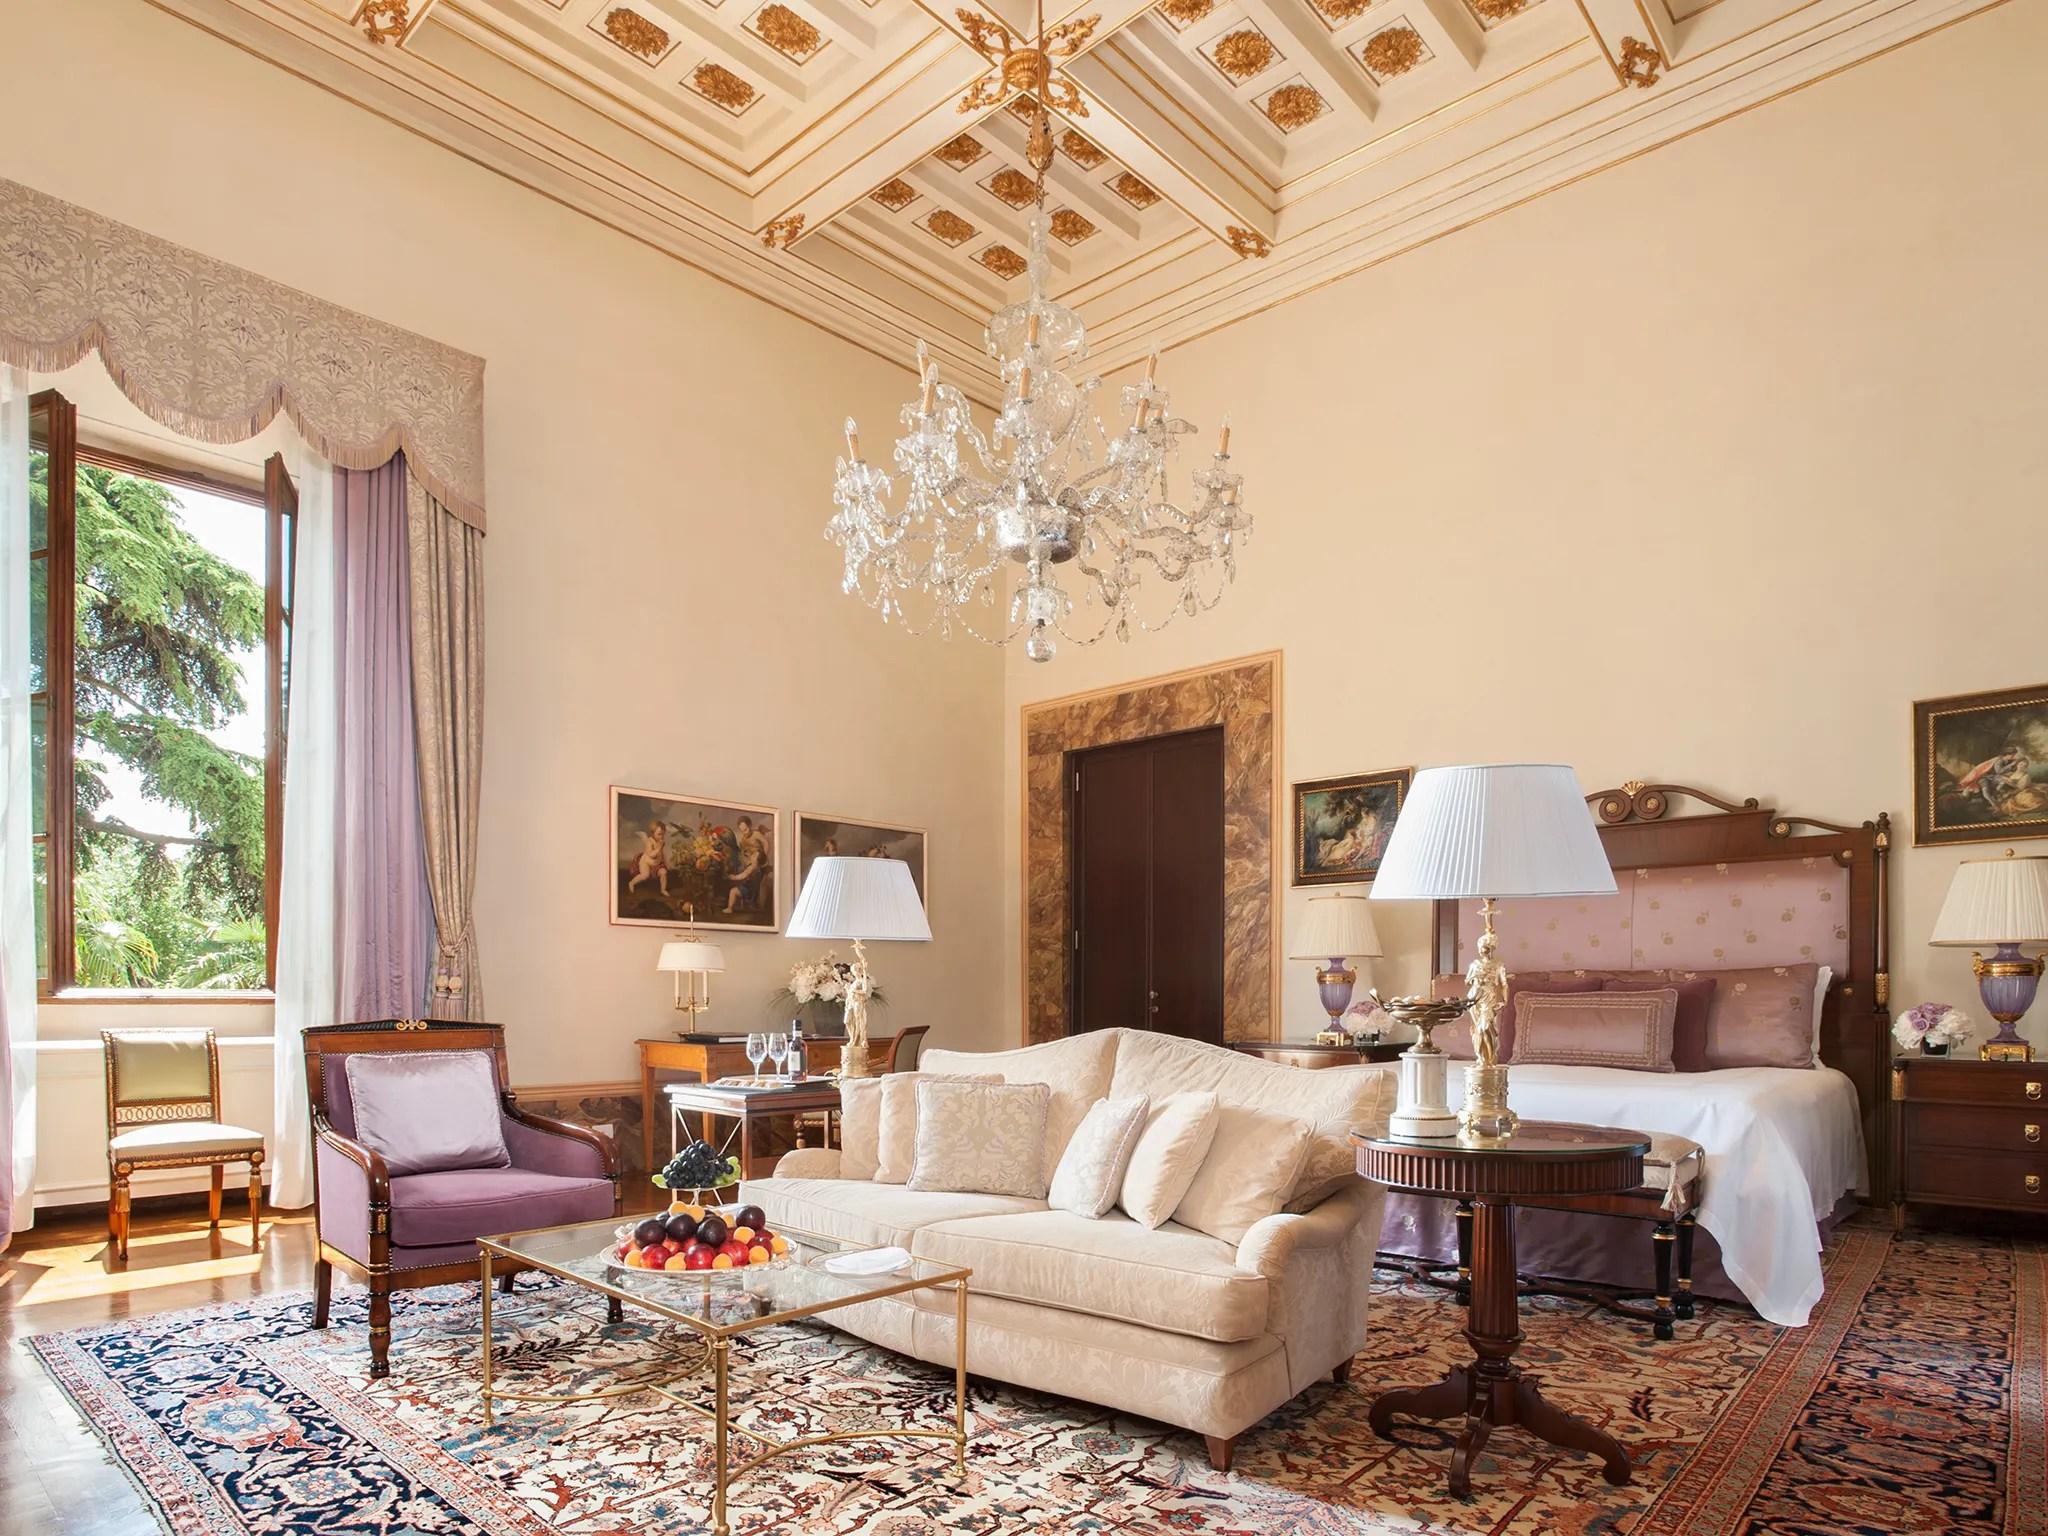 40 Best Hotels In Italy Photos Cond Nast Traveler